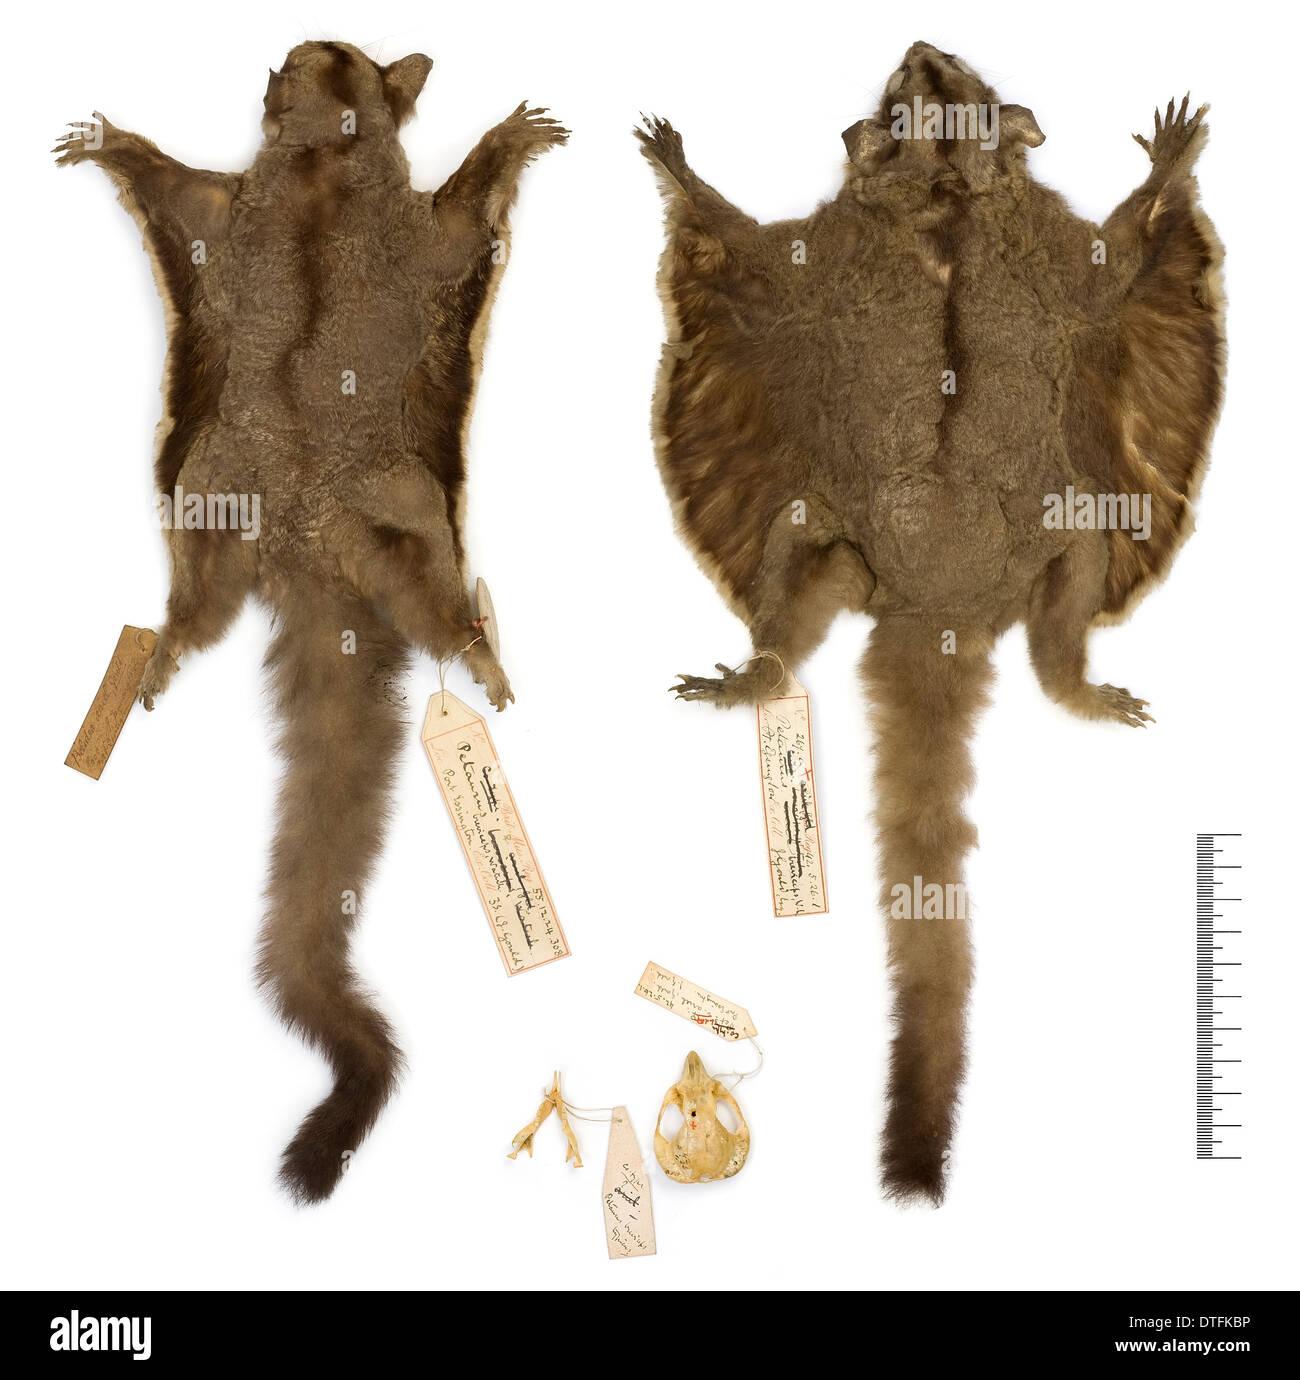 Petaurus breviceps ariel, sugar glider - Stock Image